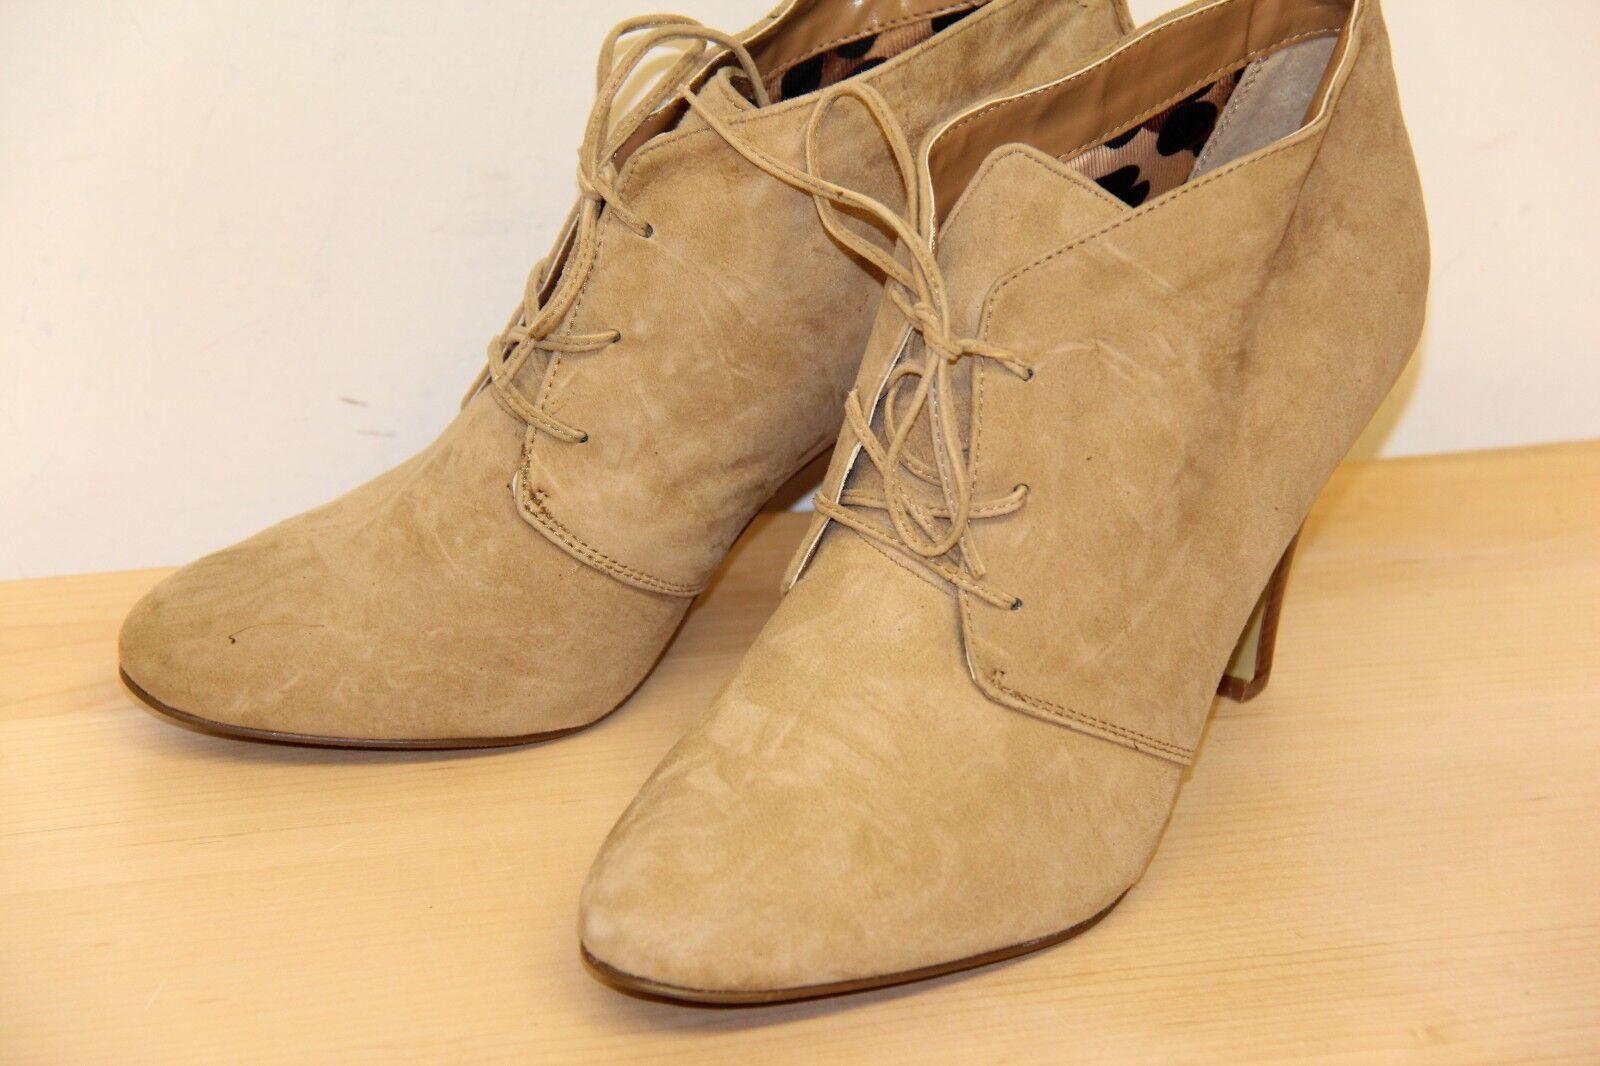 NIB ALFANI CARLINA Suede Ankle Shooties Heeel Boots Size 11 M Beige